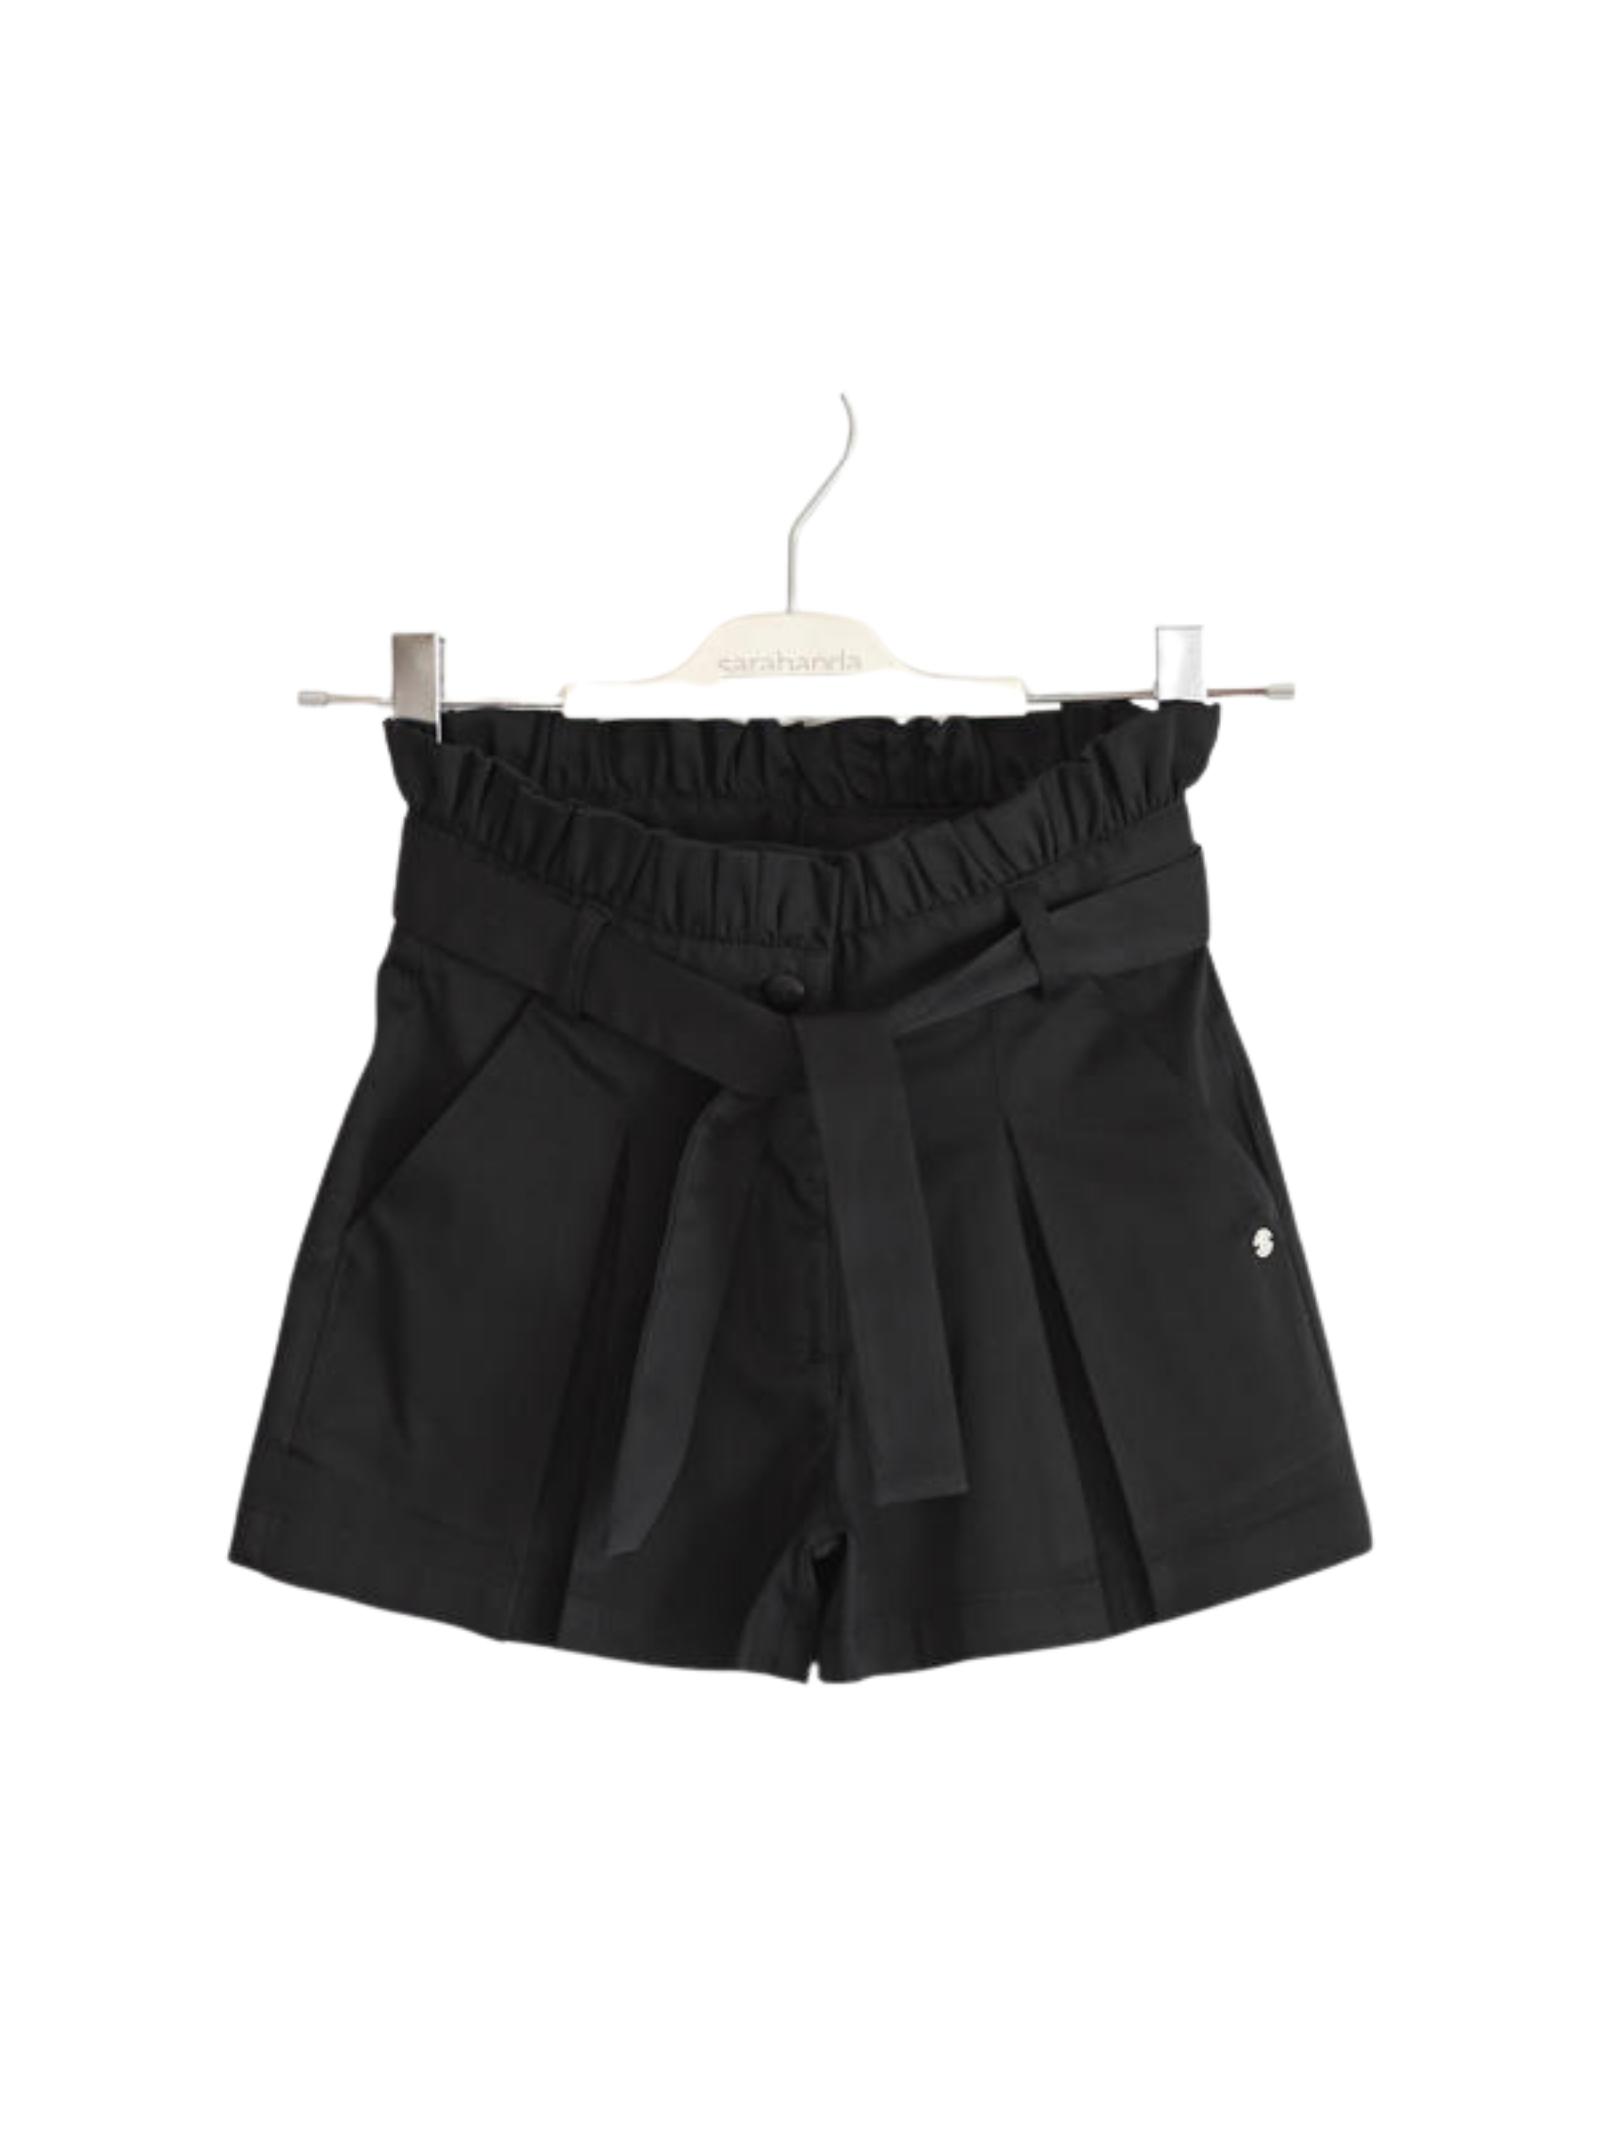 SARABANDA | Trousers | 02423000658